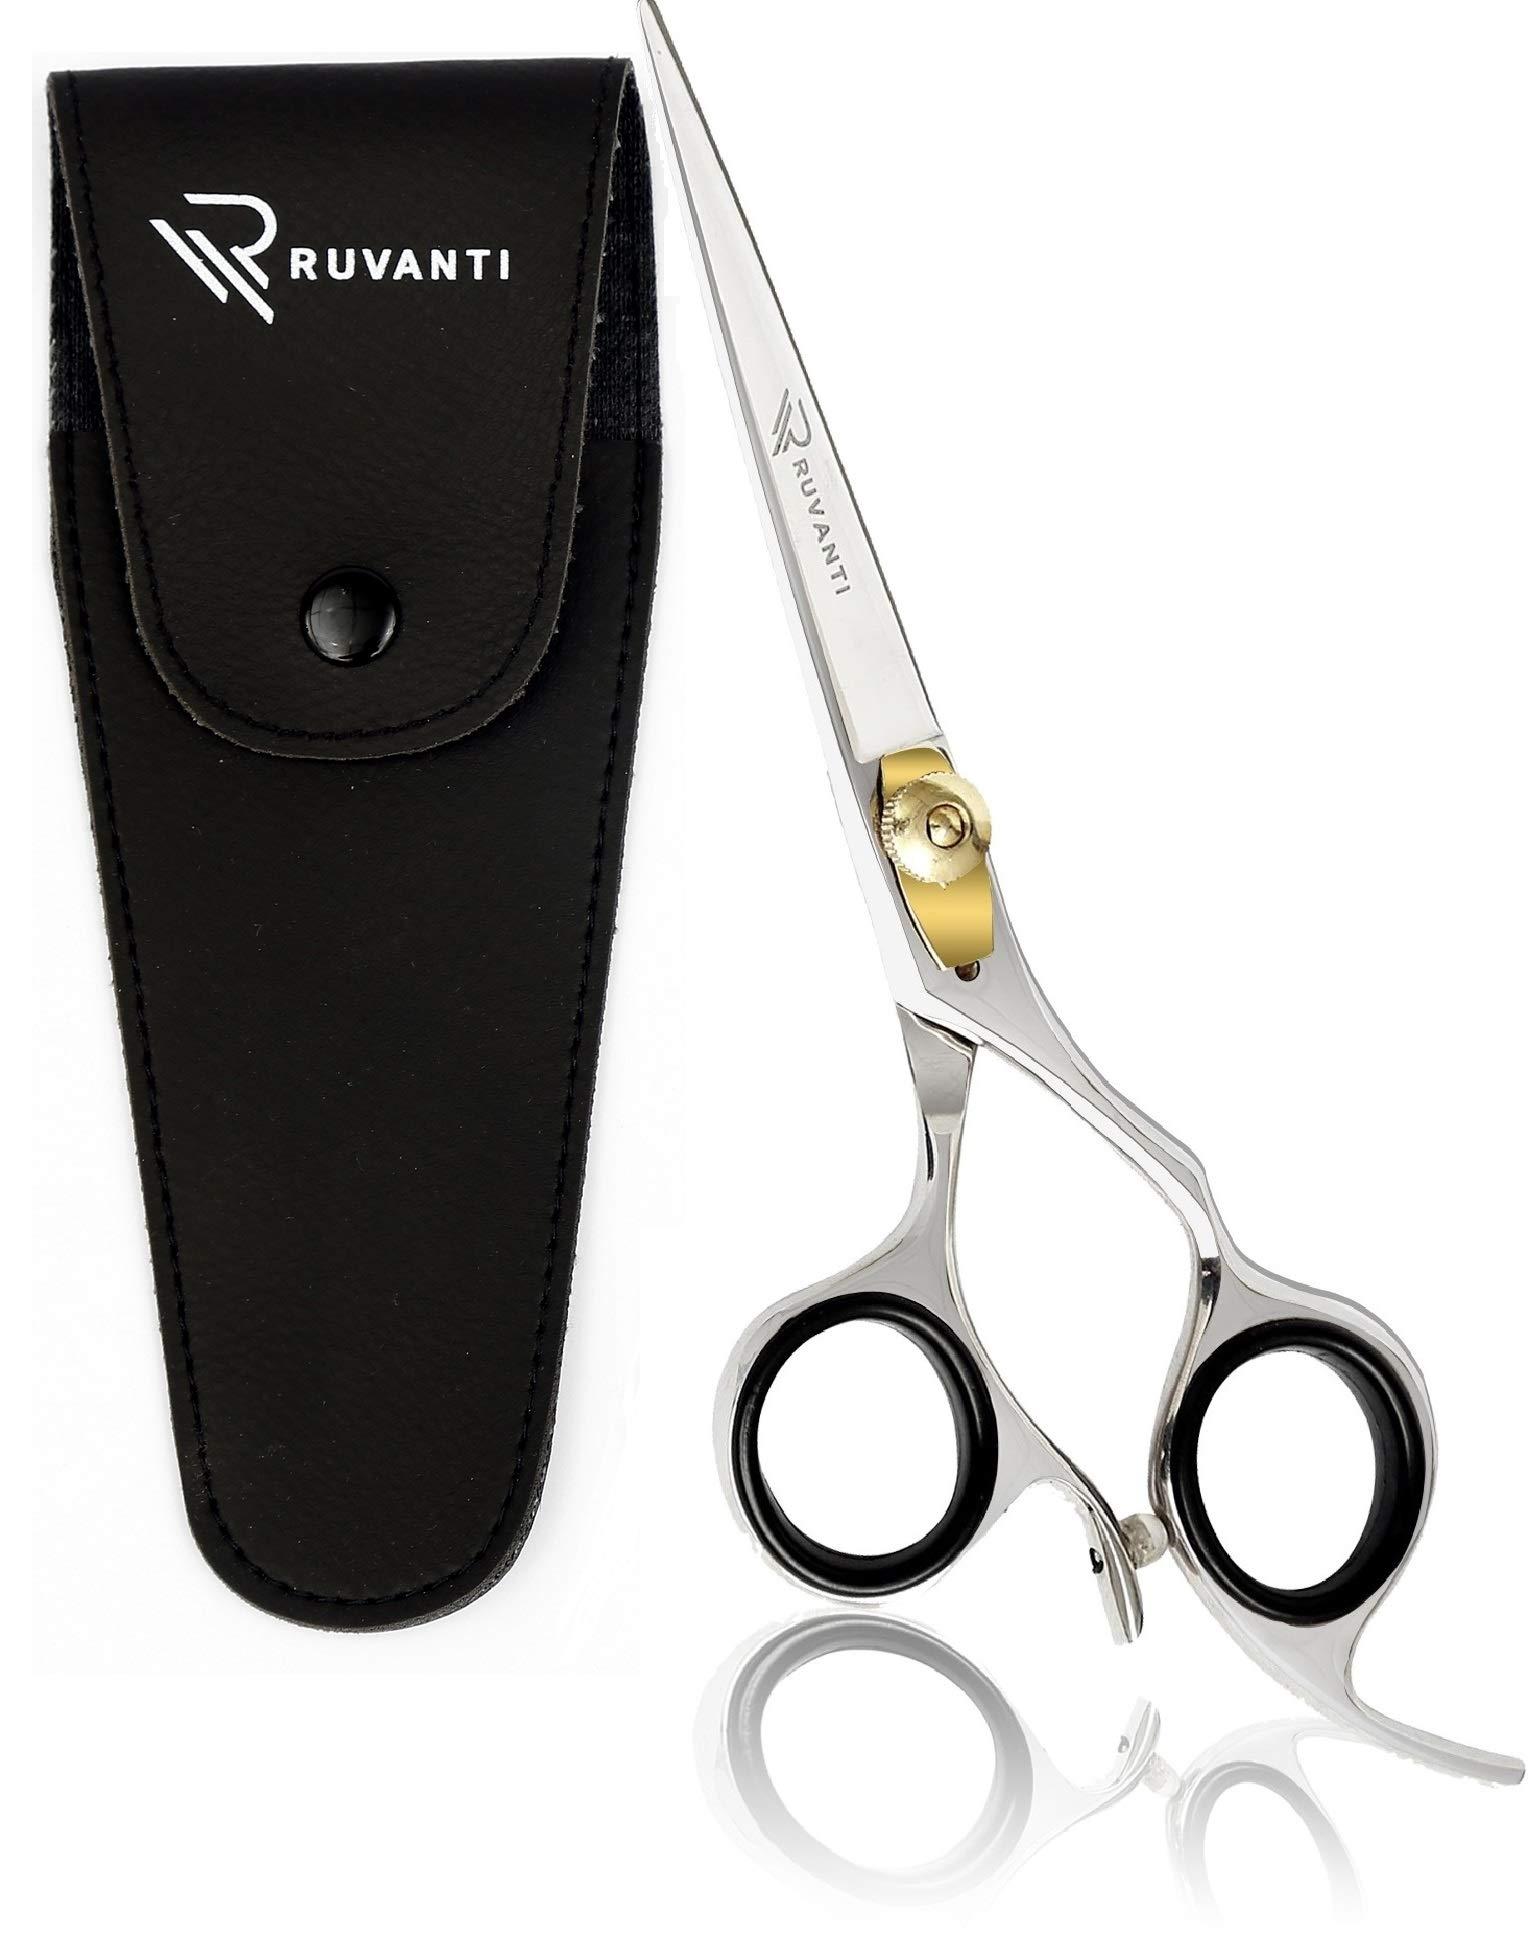 Ruvanti Professional Razor Blades Hair Scissors - Barber Hair Cutting Scissor - 6.5'' Japanese Super Cobalt Stainless Steel Hair Shear - Hairdresser Scissor/Barber Shears with Golden Adjustment Screw by Ruvanti